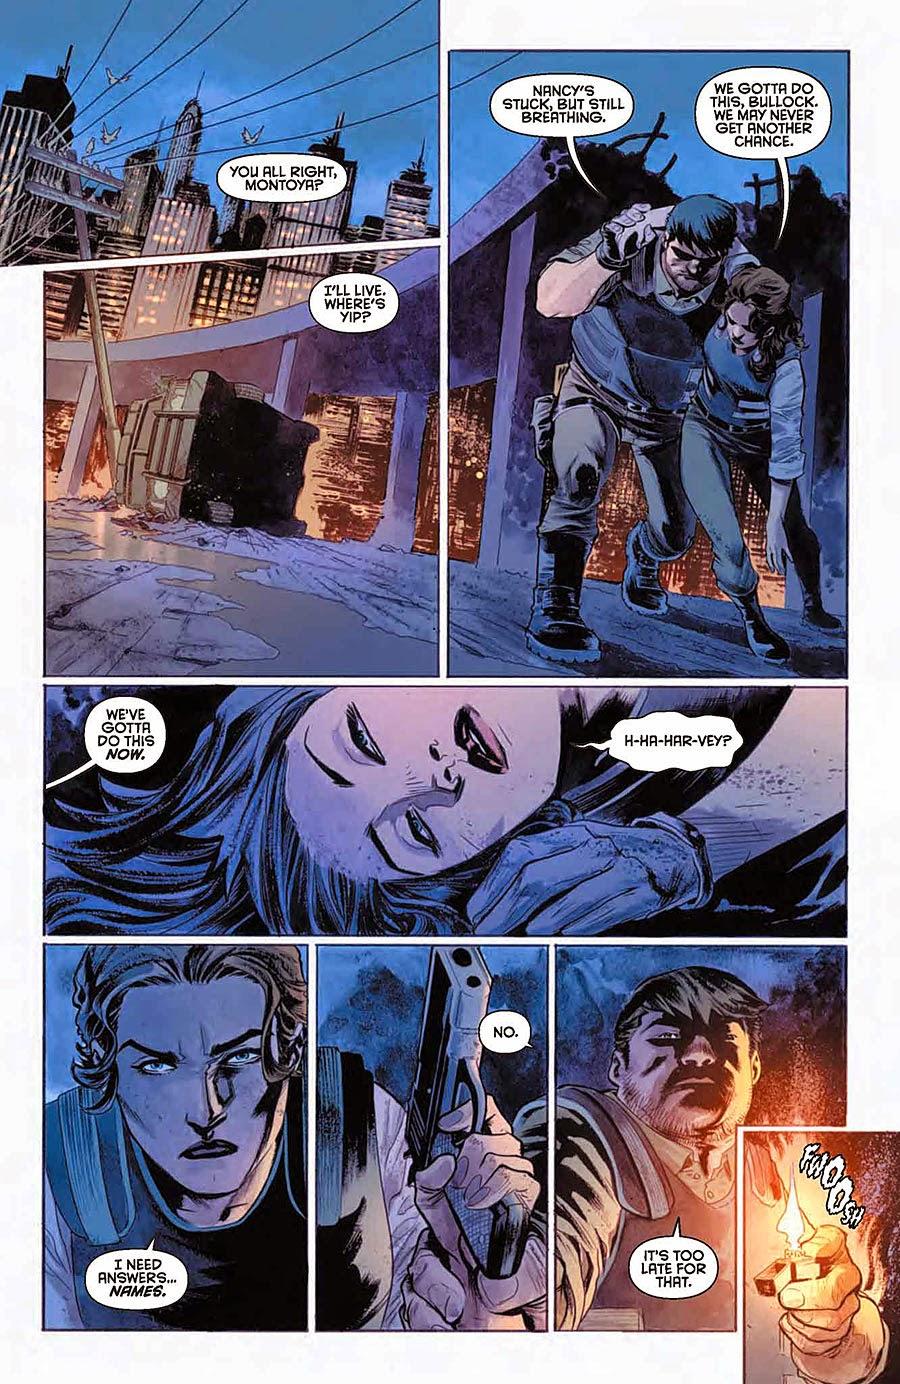 [Batman USA] - Notícias diversas do Morcego !!! - Página 2 DTC-950-dyluxlo-res-crop-Page-7-2048-554914d2b61af6-35701942-d5508